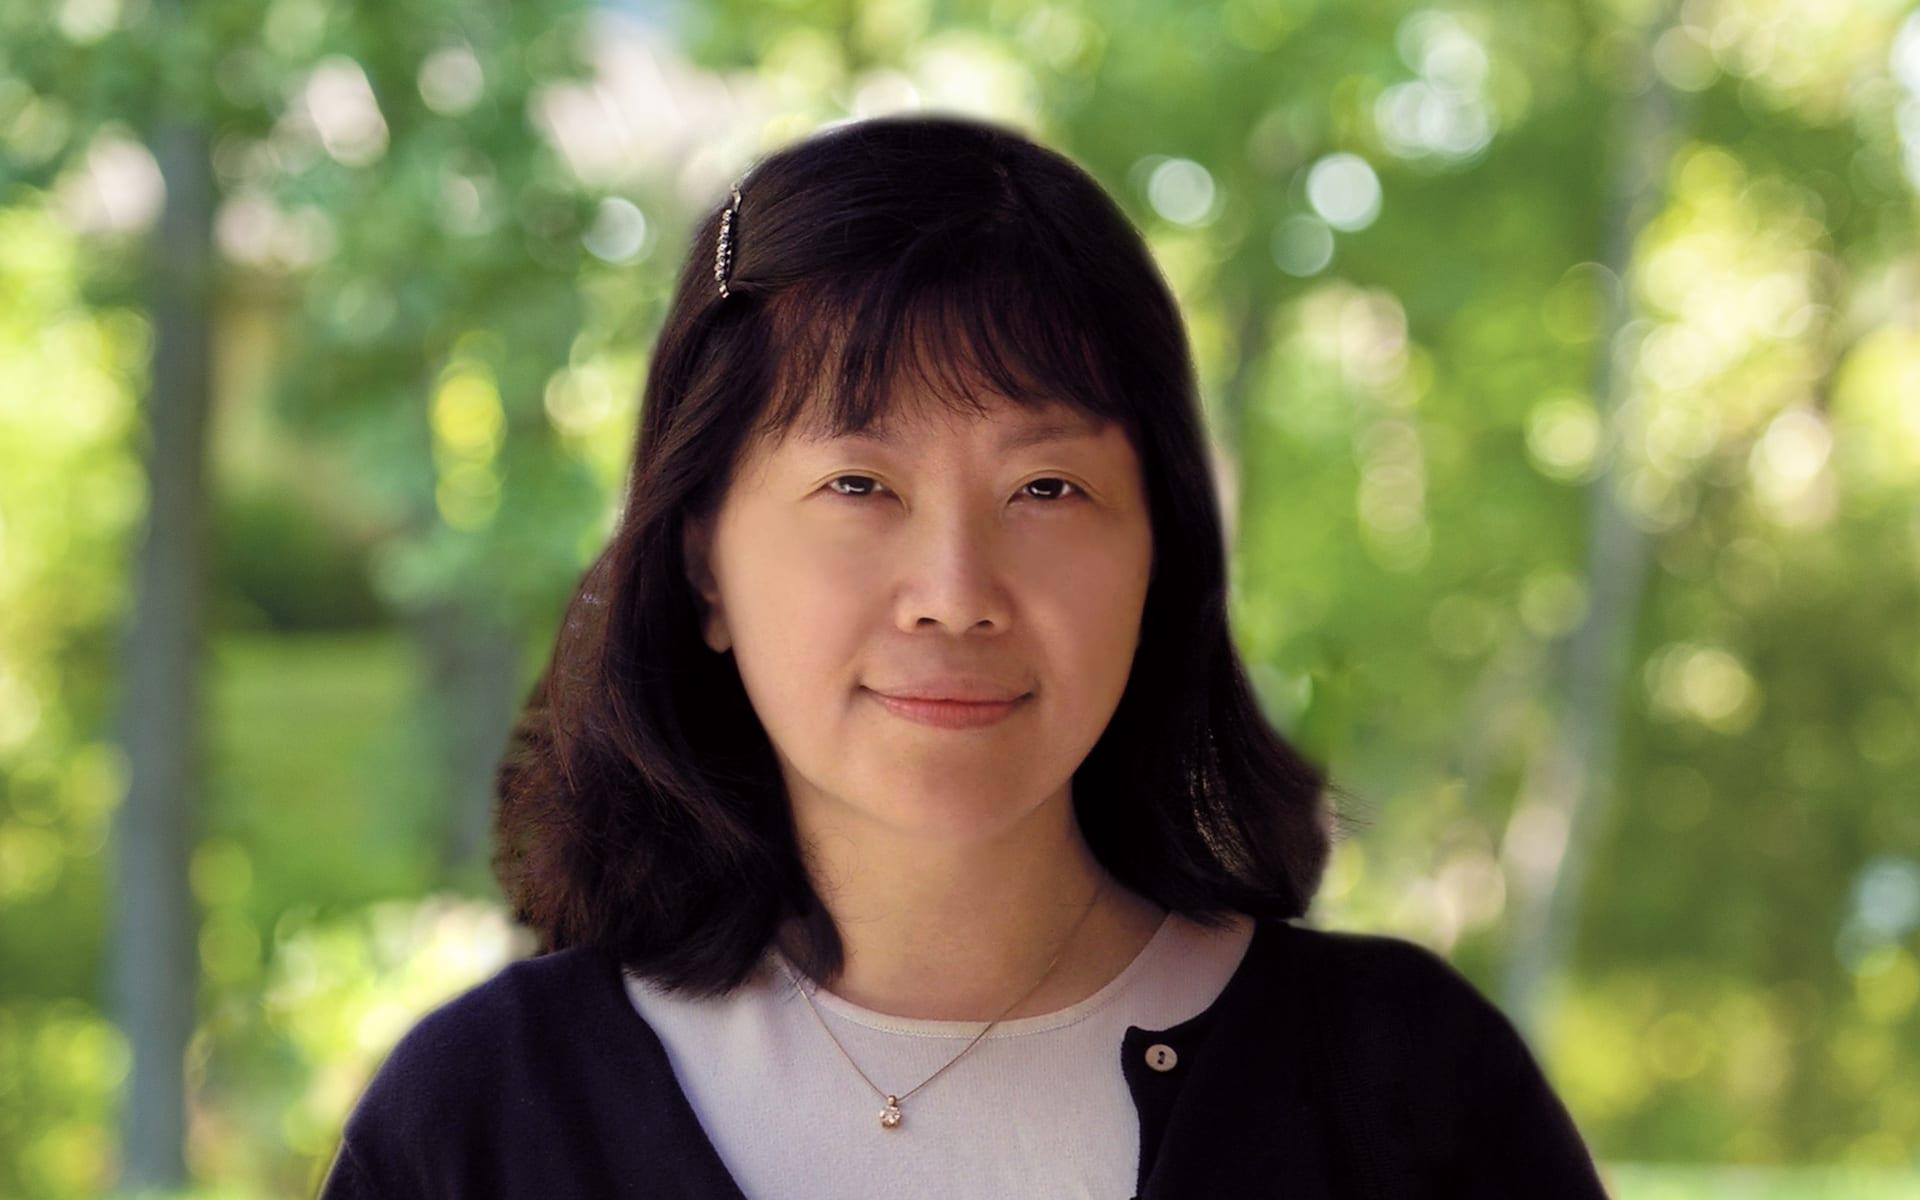 Jenny Tsai Chen